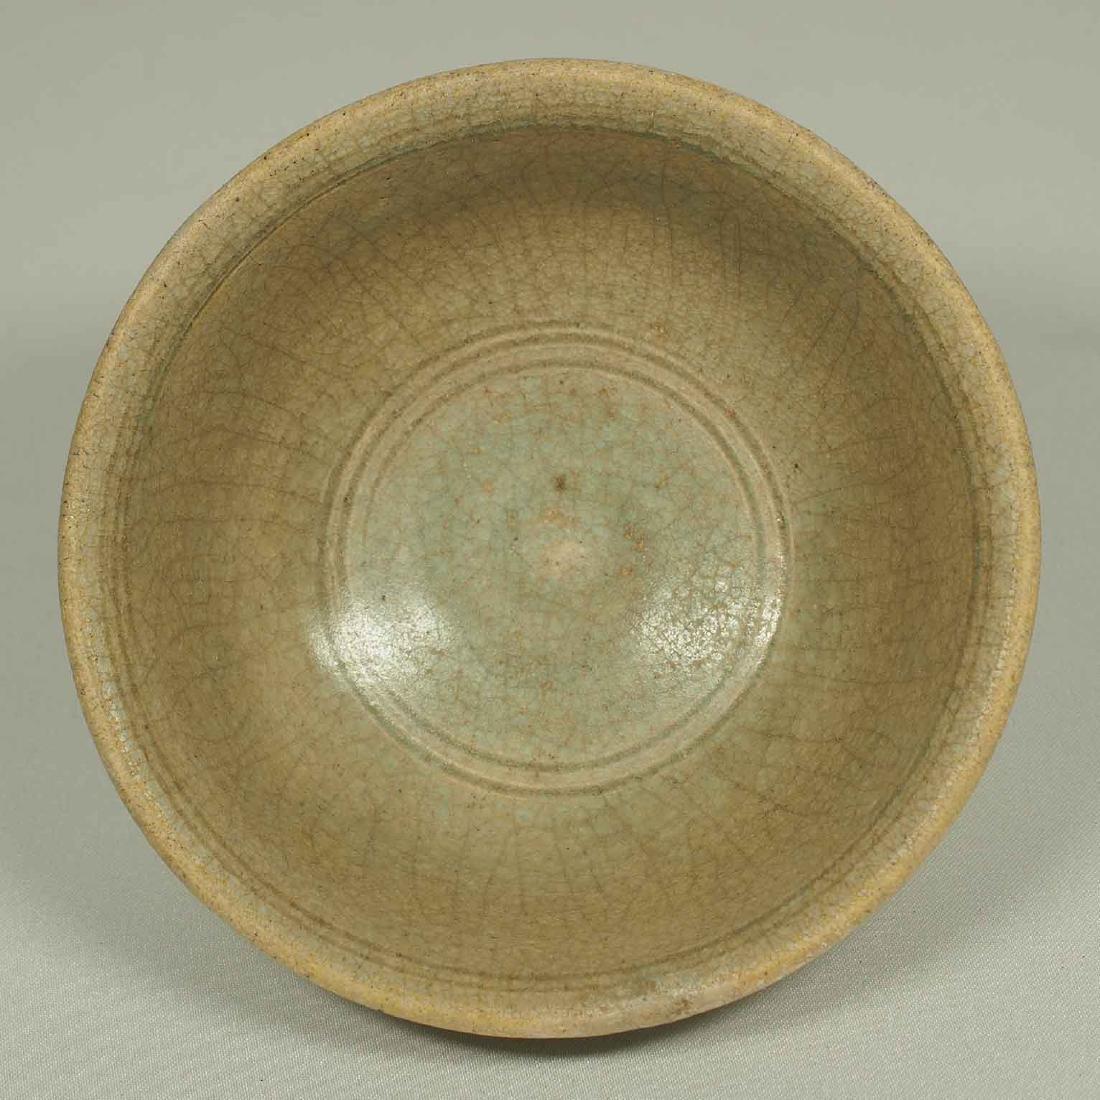 Celadon Crackled Bowl, Annamese